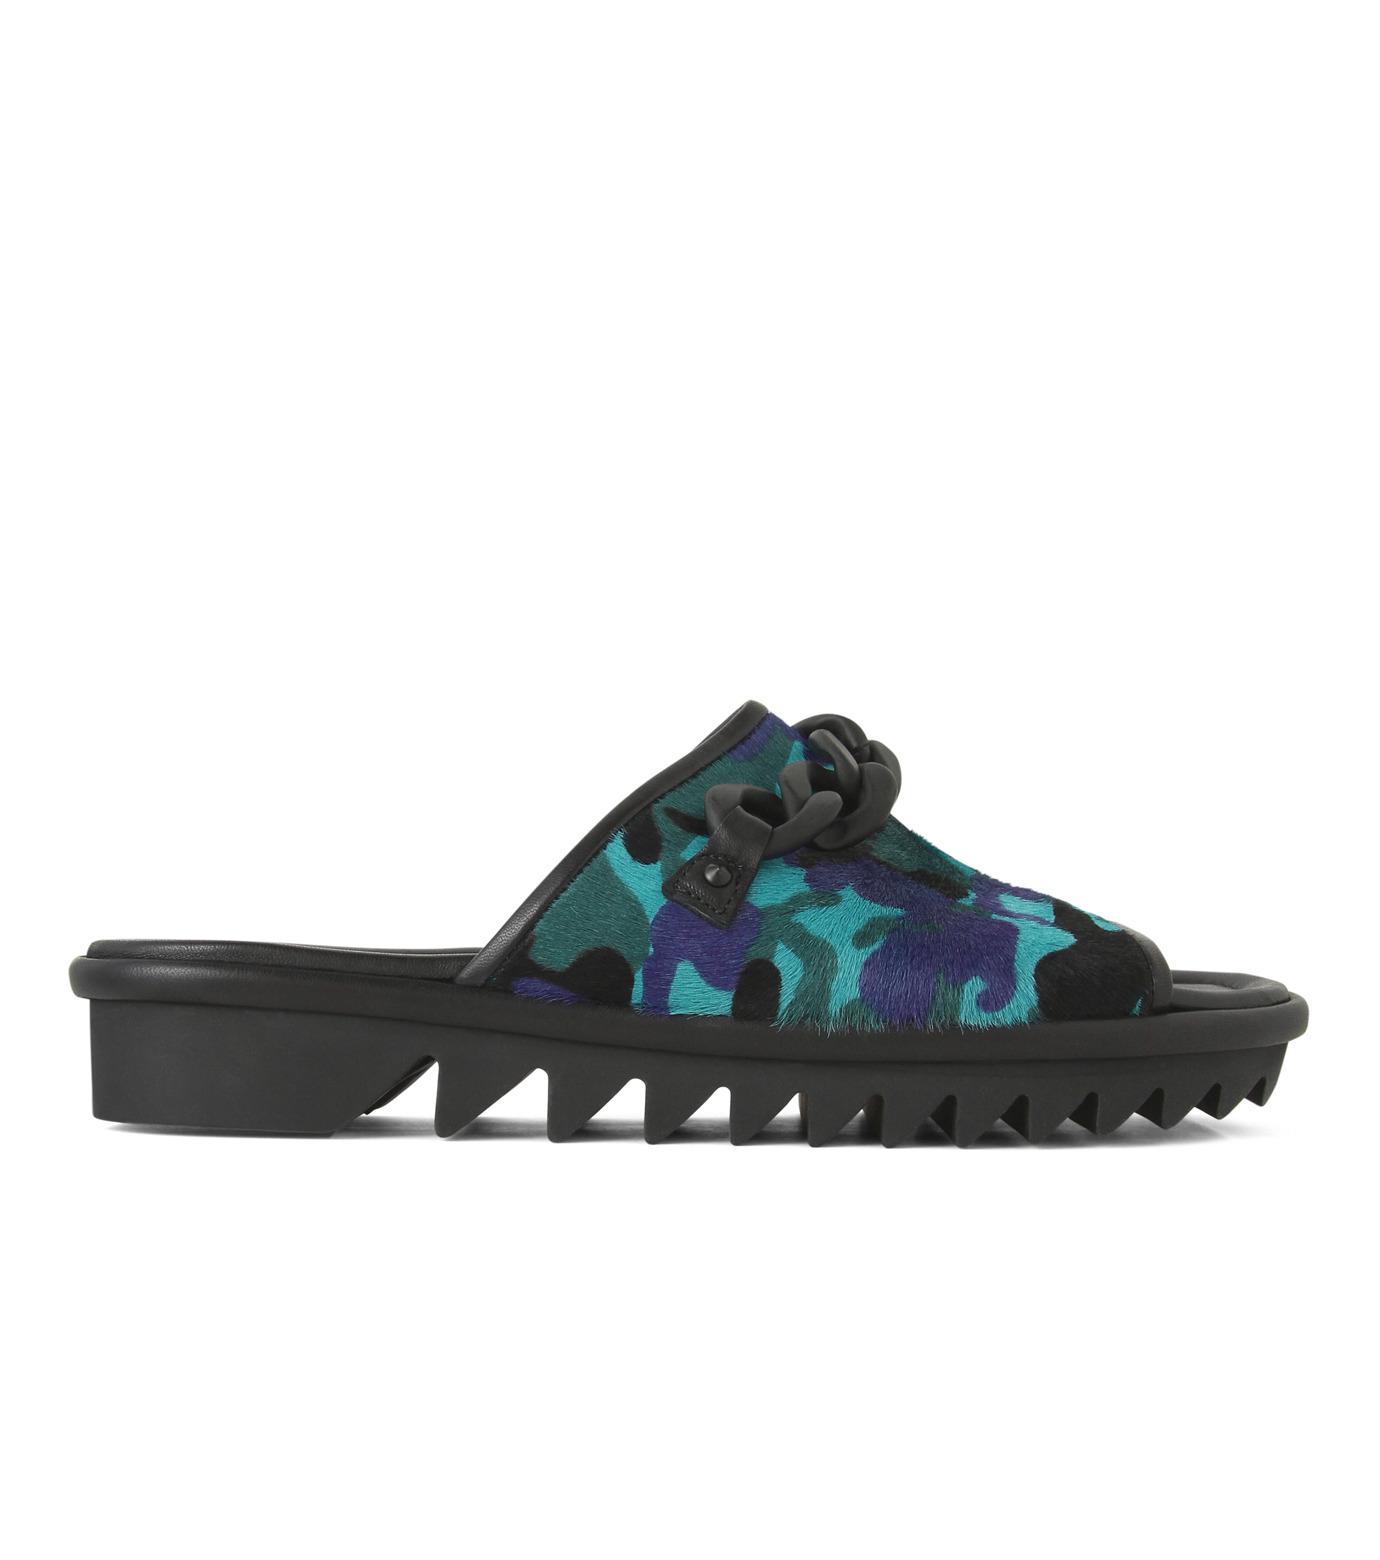 Giuseppe Zanotti Design(ジュゼッペザノッティ)のBaby Fur Camouflage Slippers-BLUE(シューズ/shoes)-RM5067LO-T-92 拡大詳細画像1